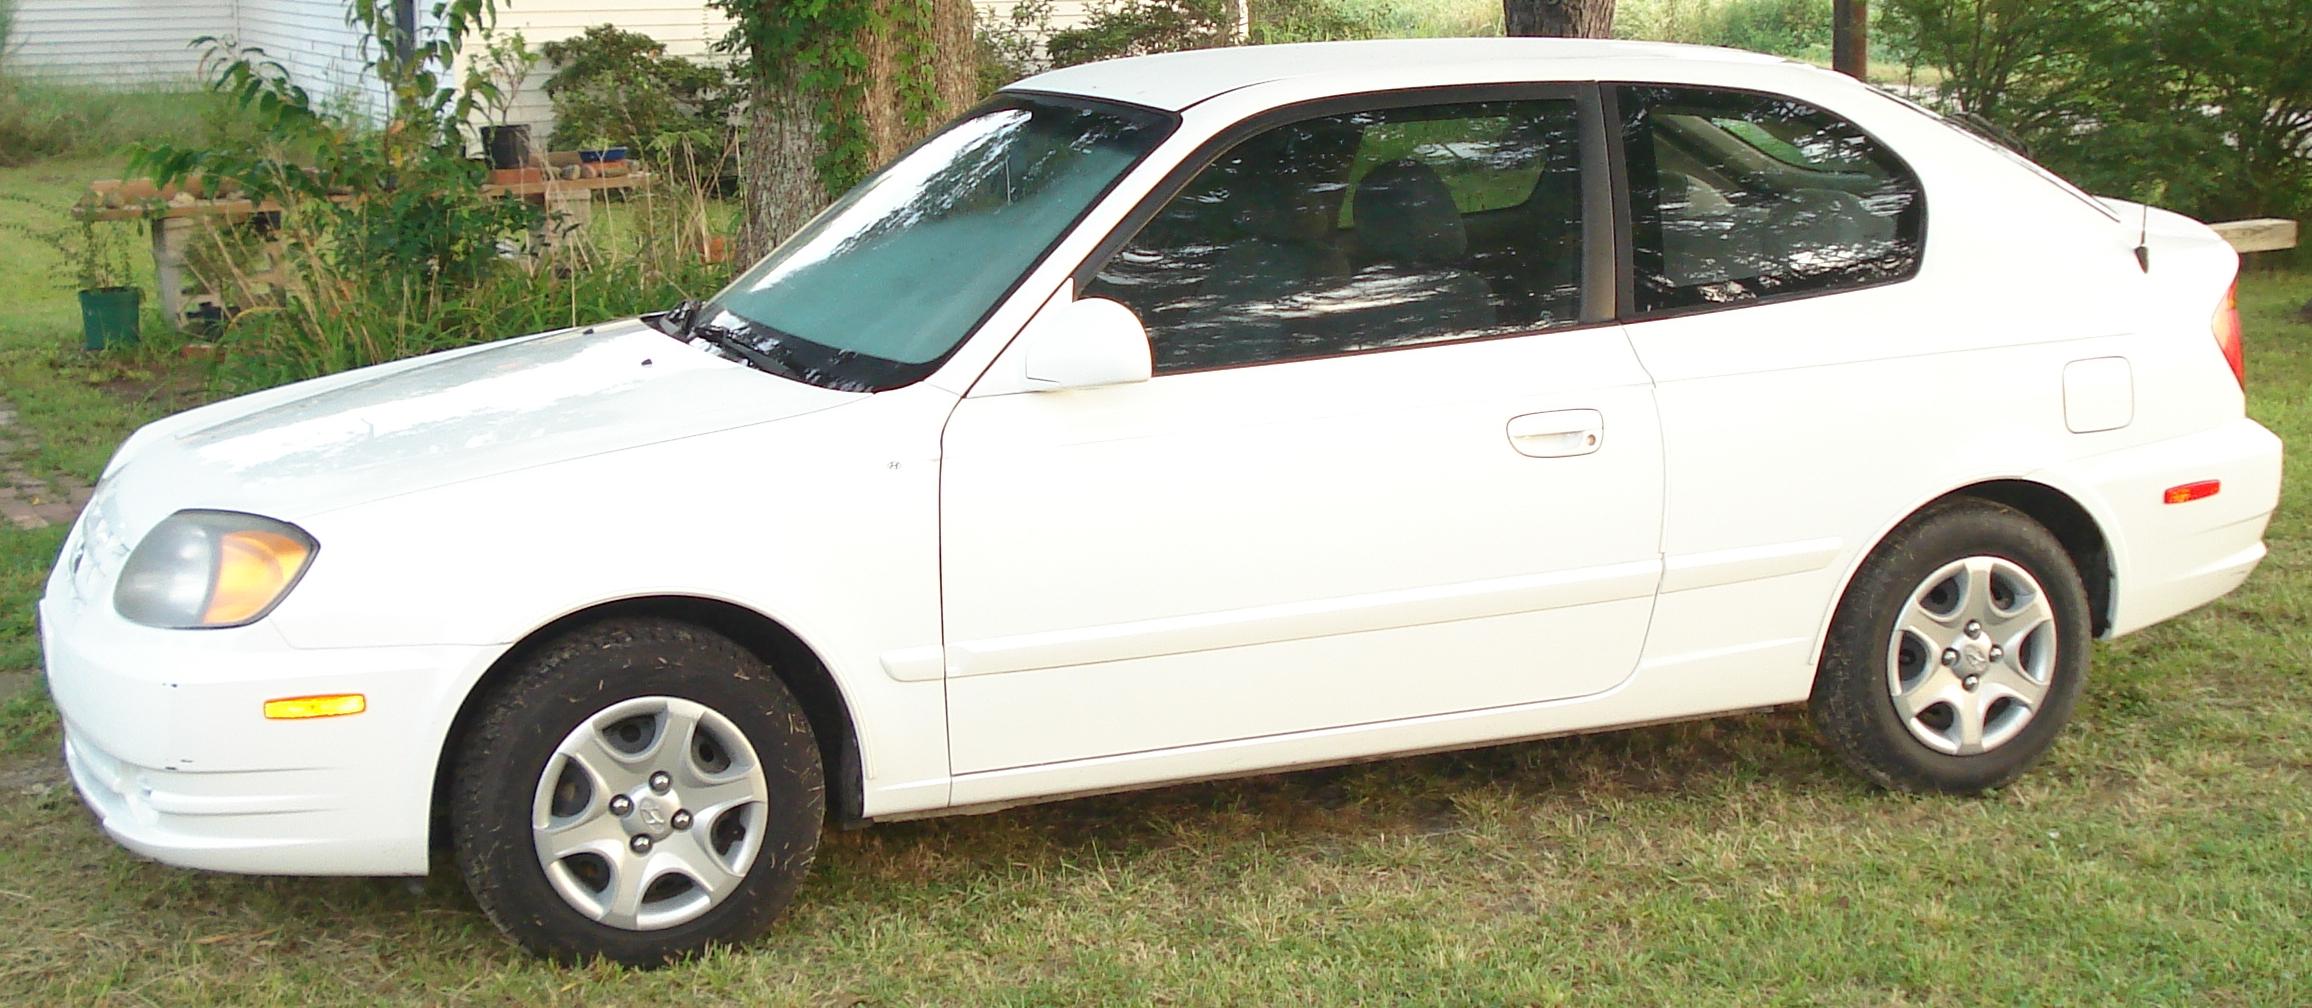 2005 Hyundai Accent Image 13